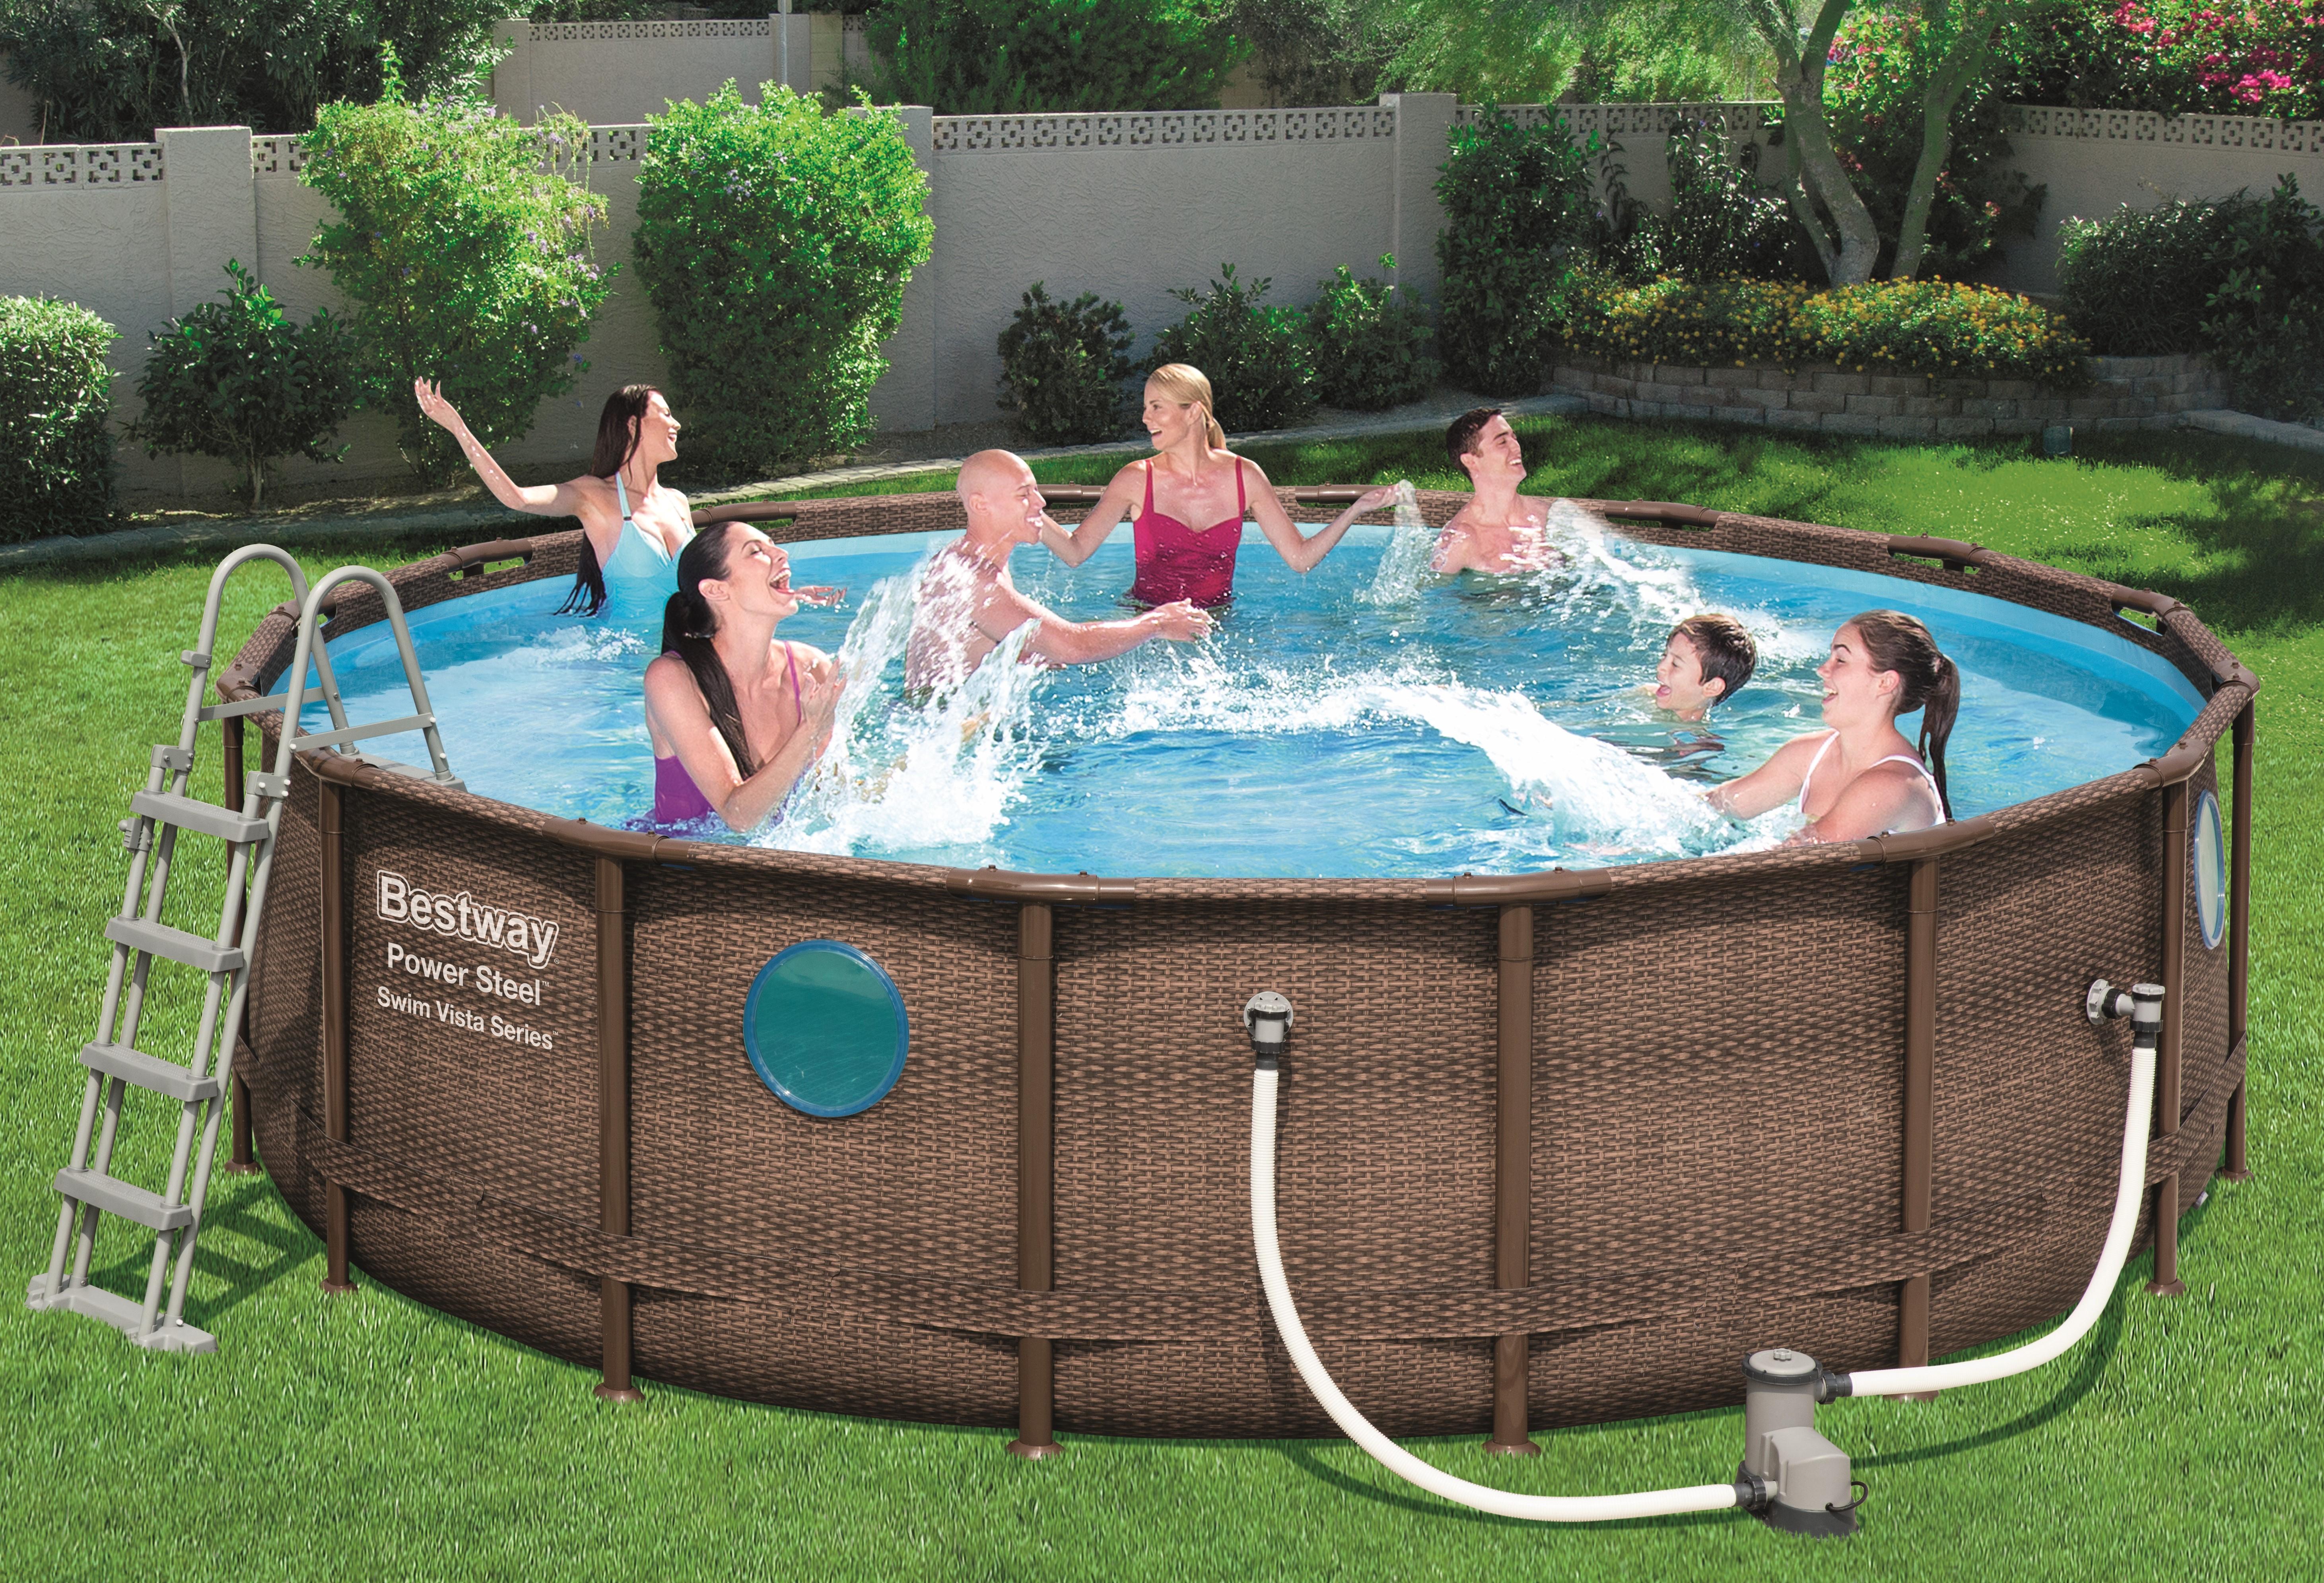 piscine power steel vista rotin marron 4.88 x 1.22m